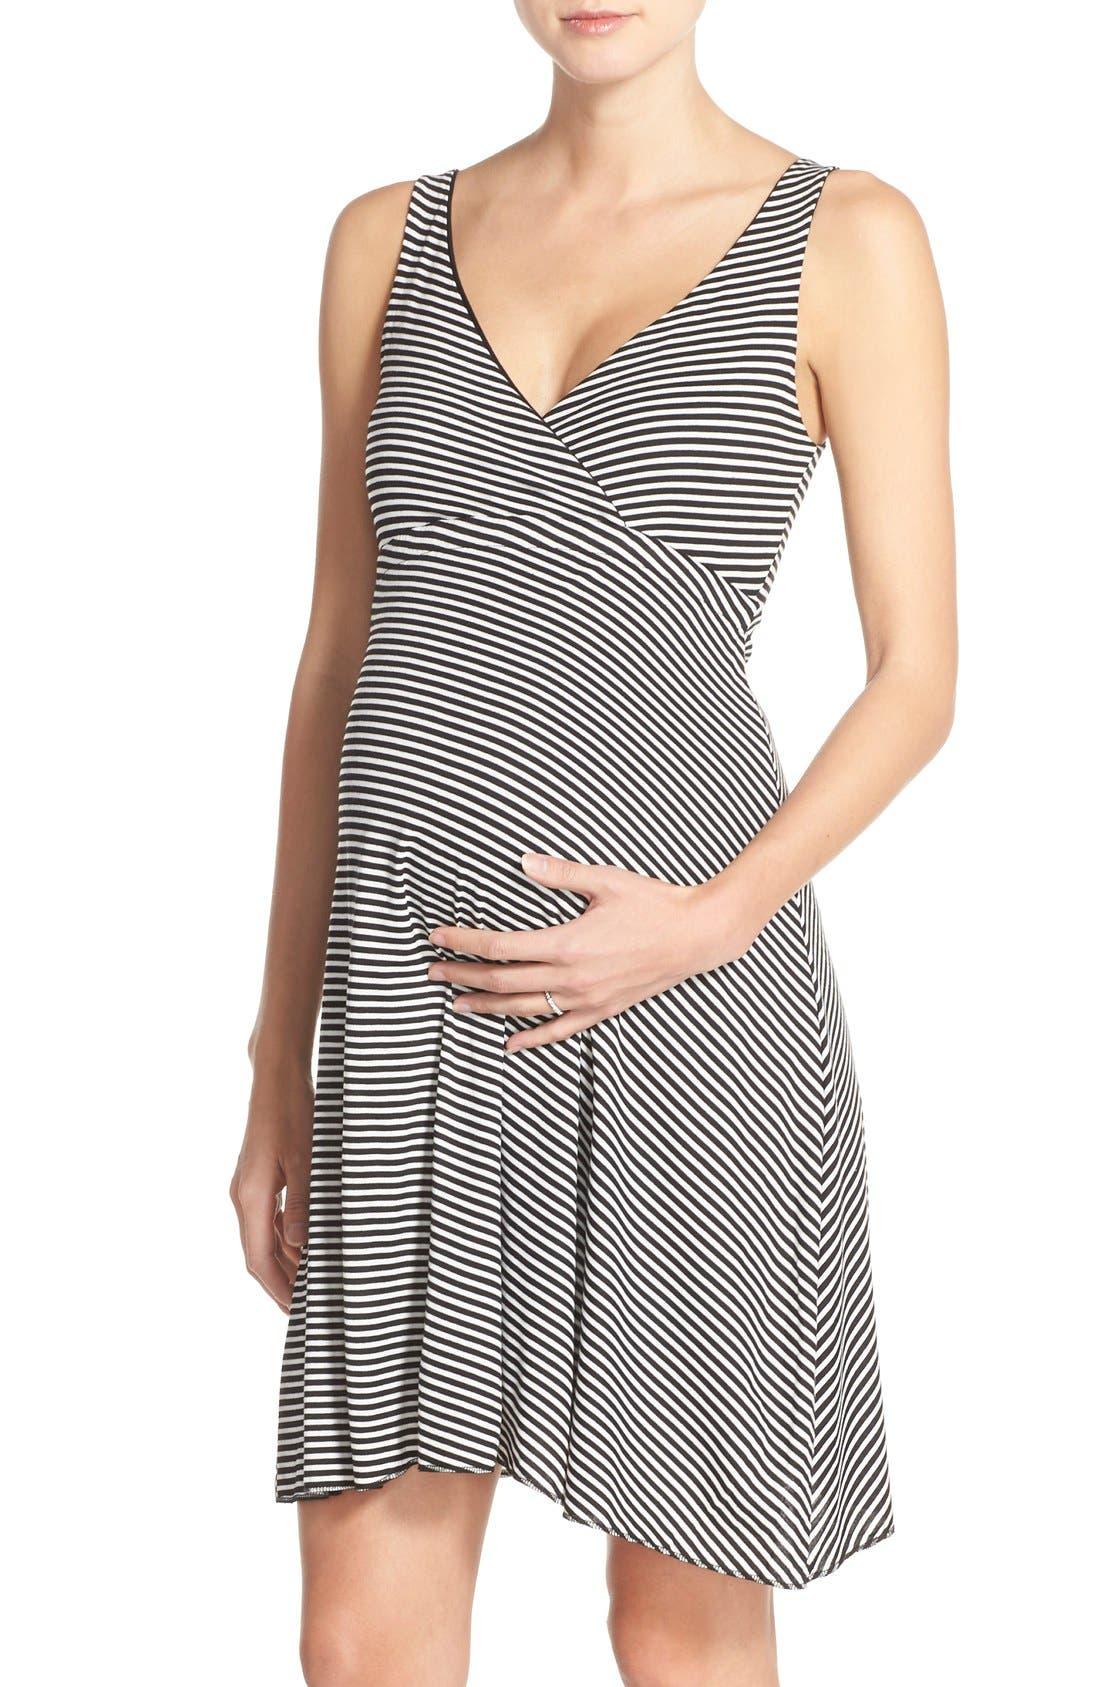 Reversible Nursing Dress,                         Main,                         color, Black Stripe